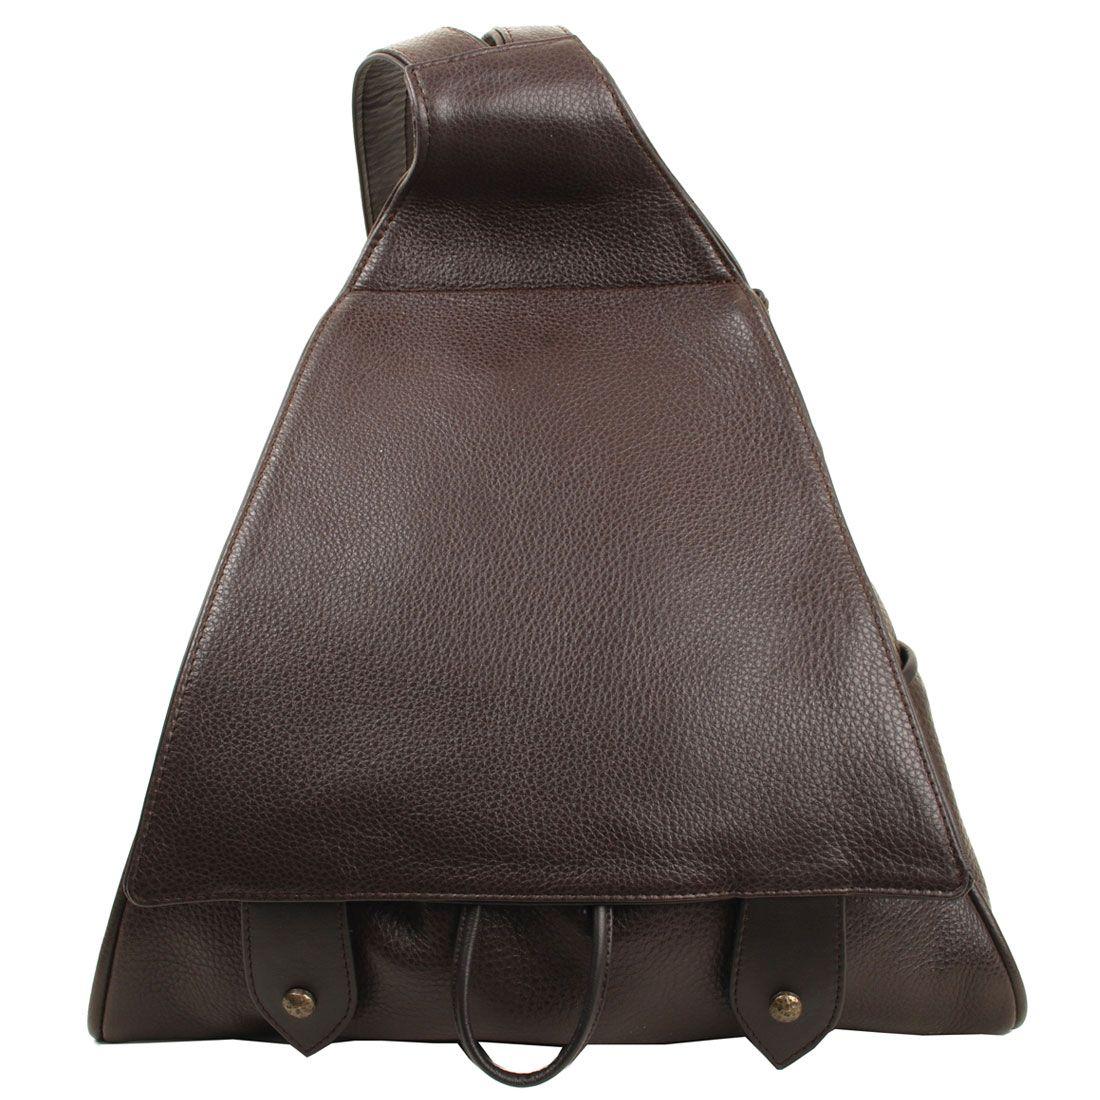 leather rucksack, ruck sacks, womens rucksack, small rucksack, brown shoulder bag, brown leather tote bags for women, jane hopkinson bags, shoulder bags women   Jane Hopkinson Bags